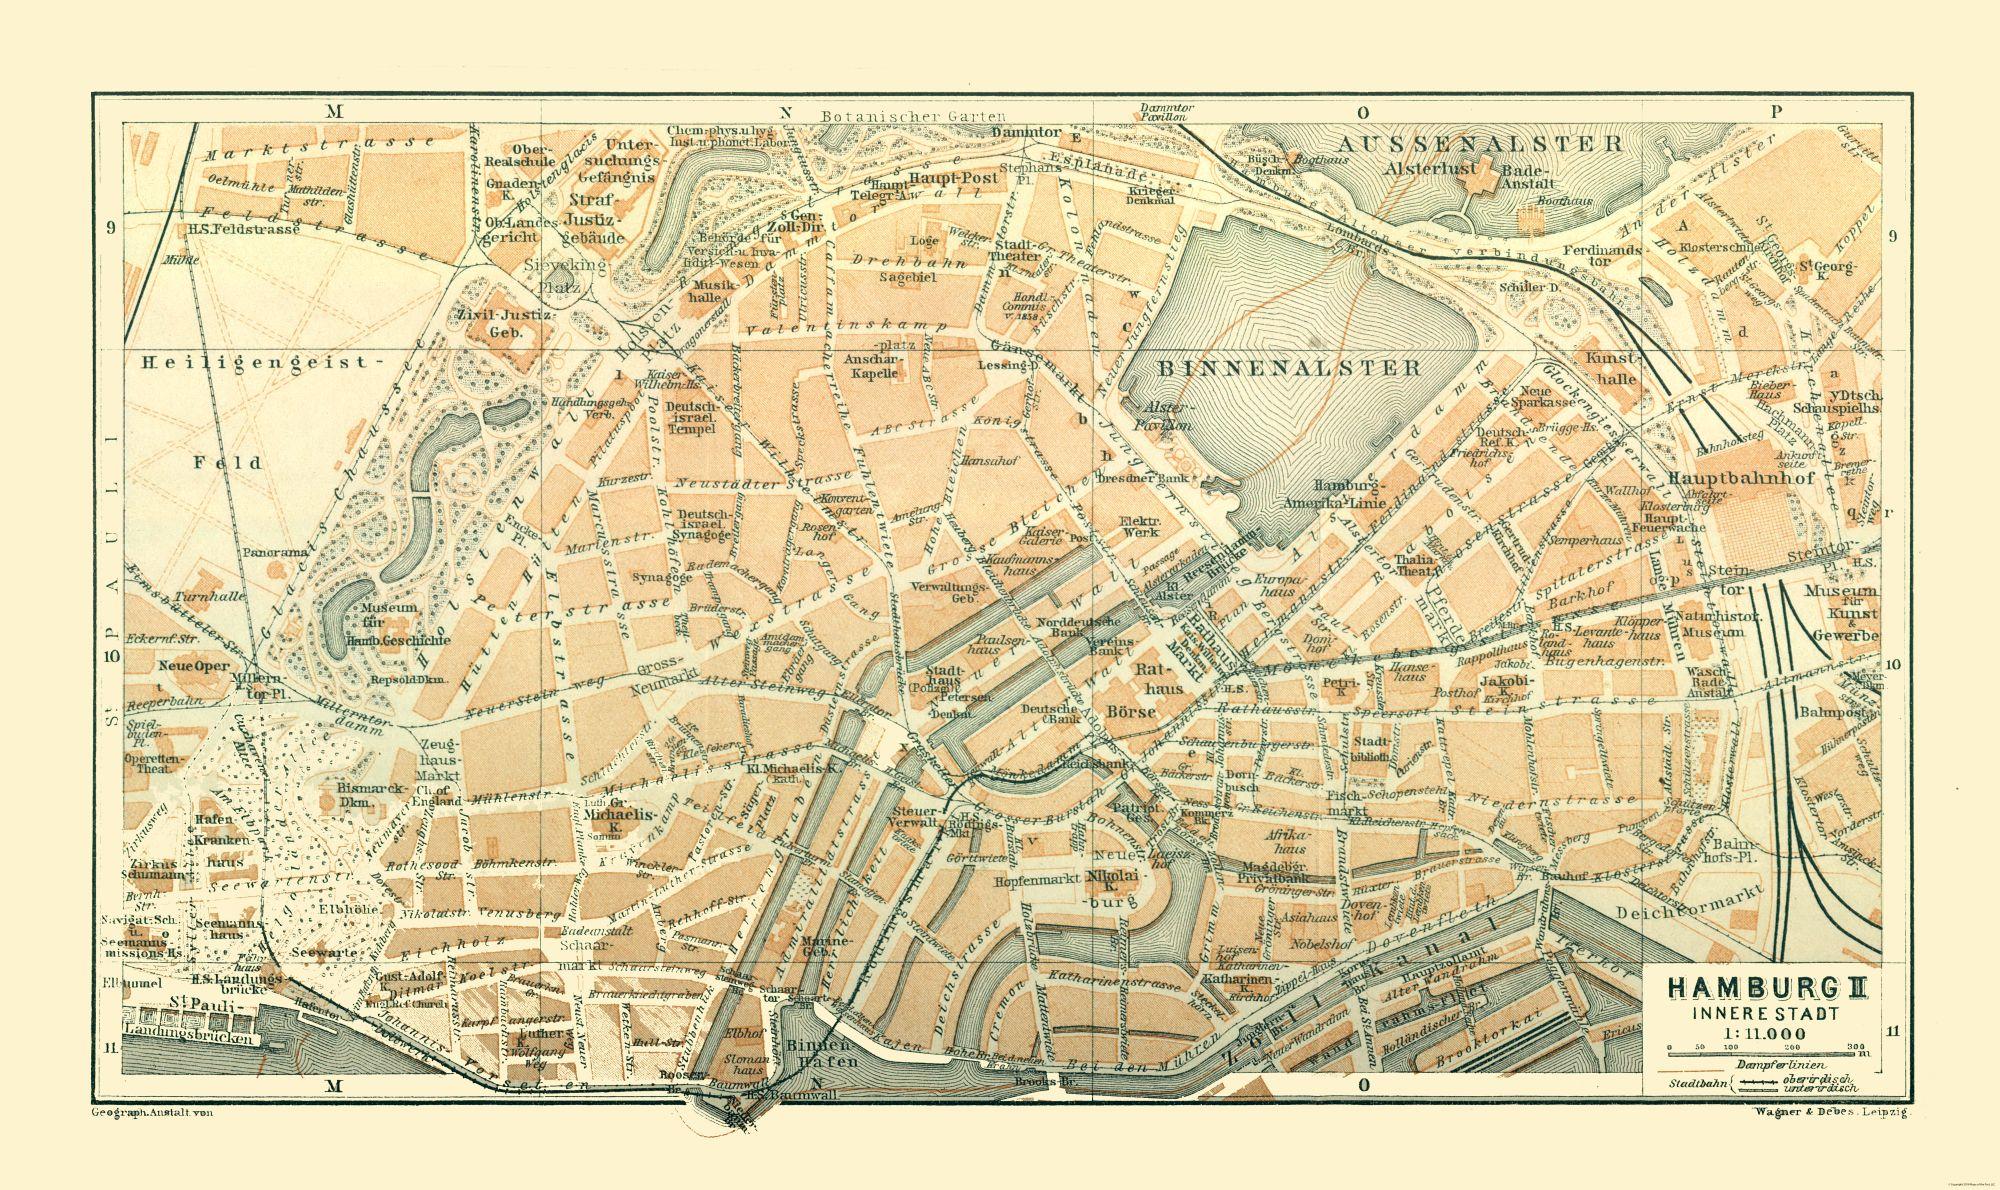 Map Of Germany In 1914.International Map Hamburg Germany Baedeker 1914 38 65 X 23